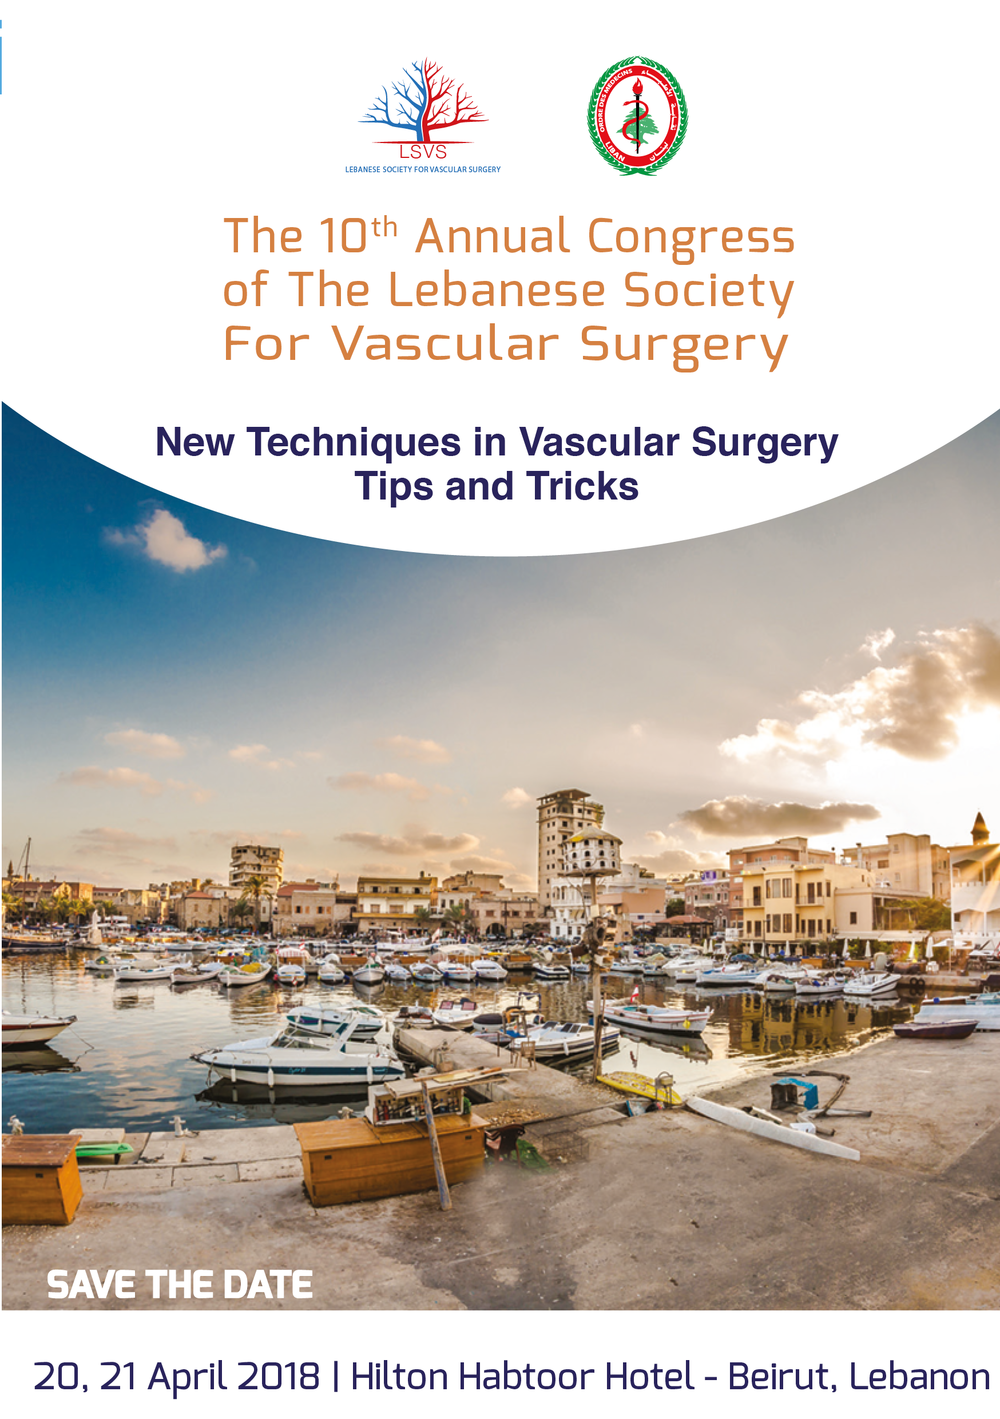 Vascular Surgery7.png